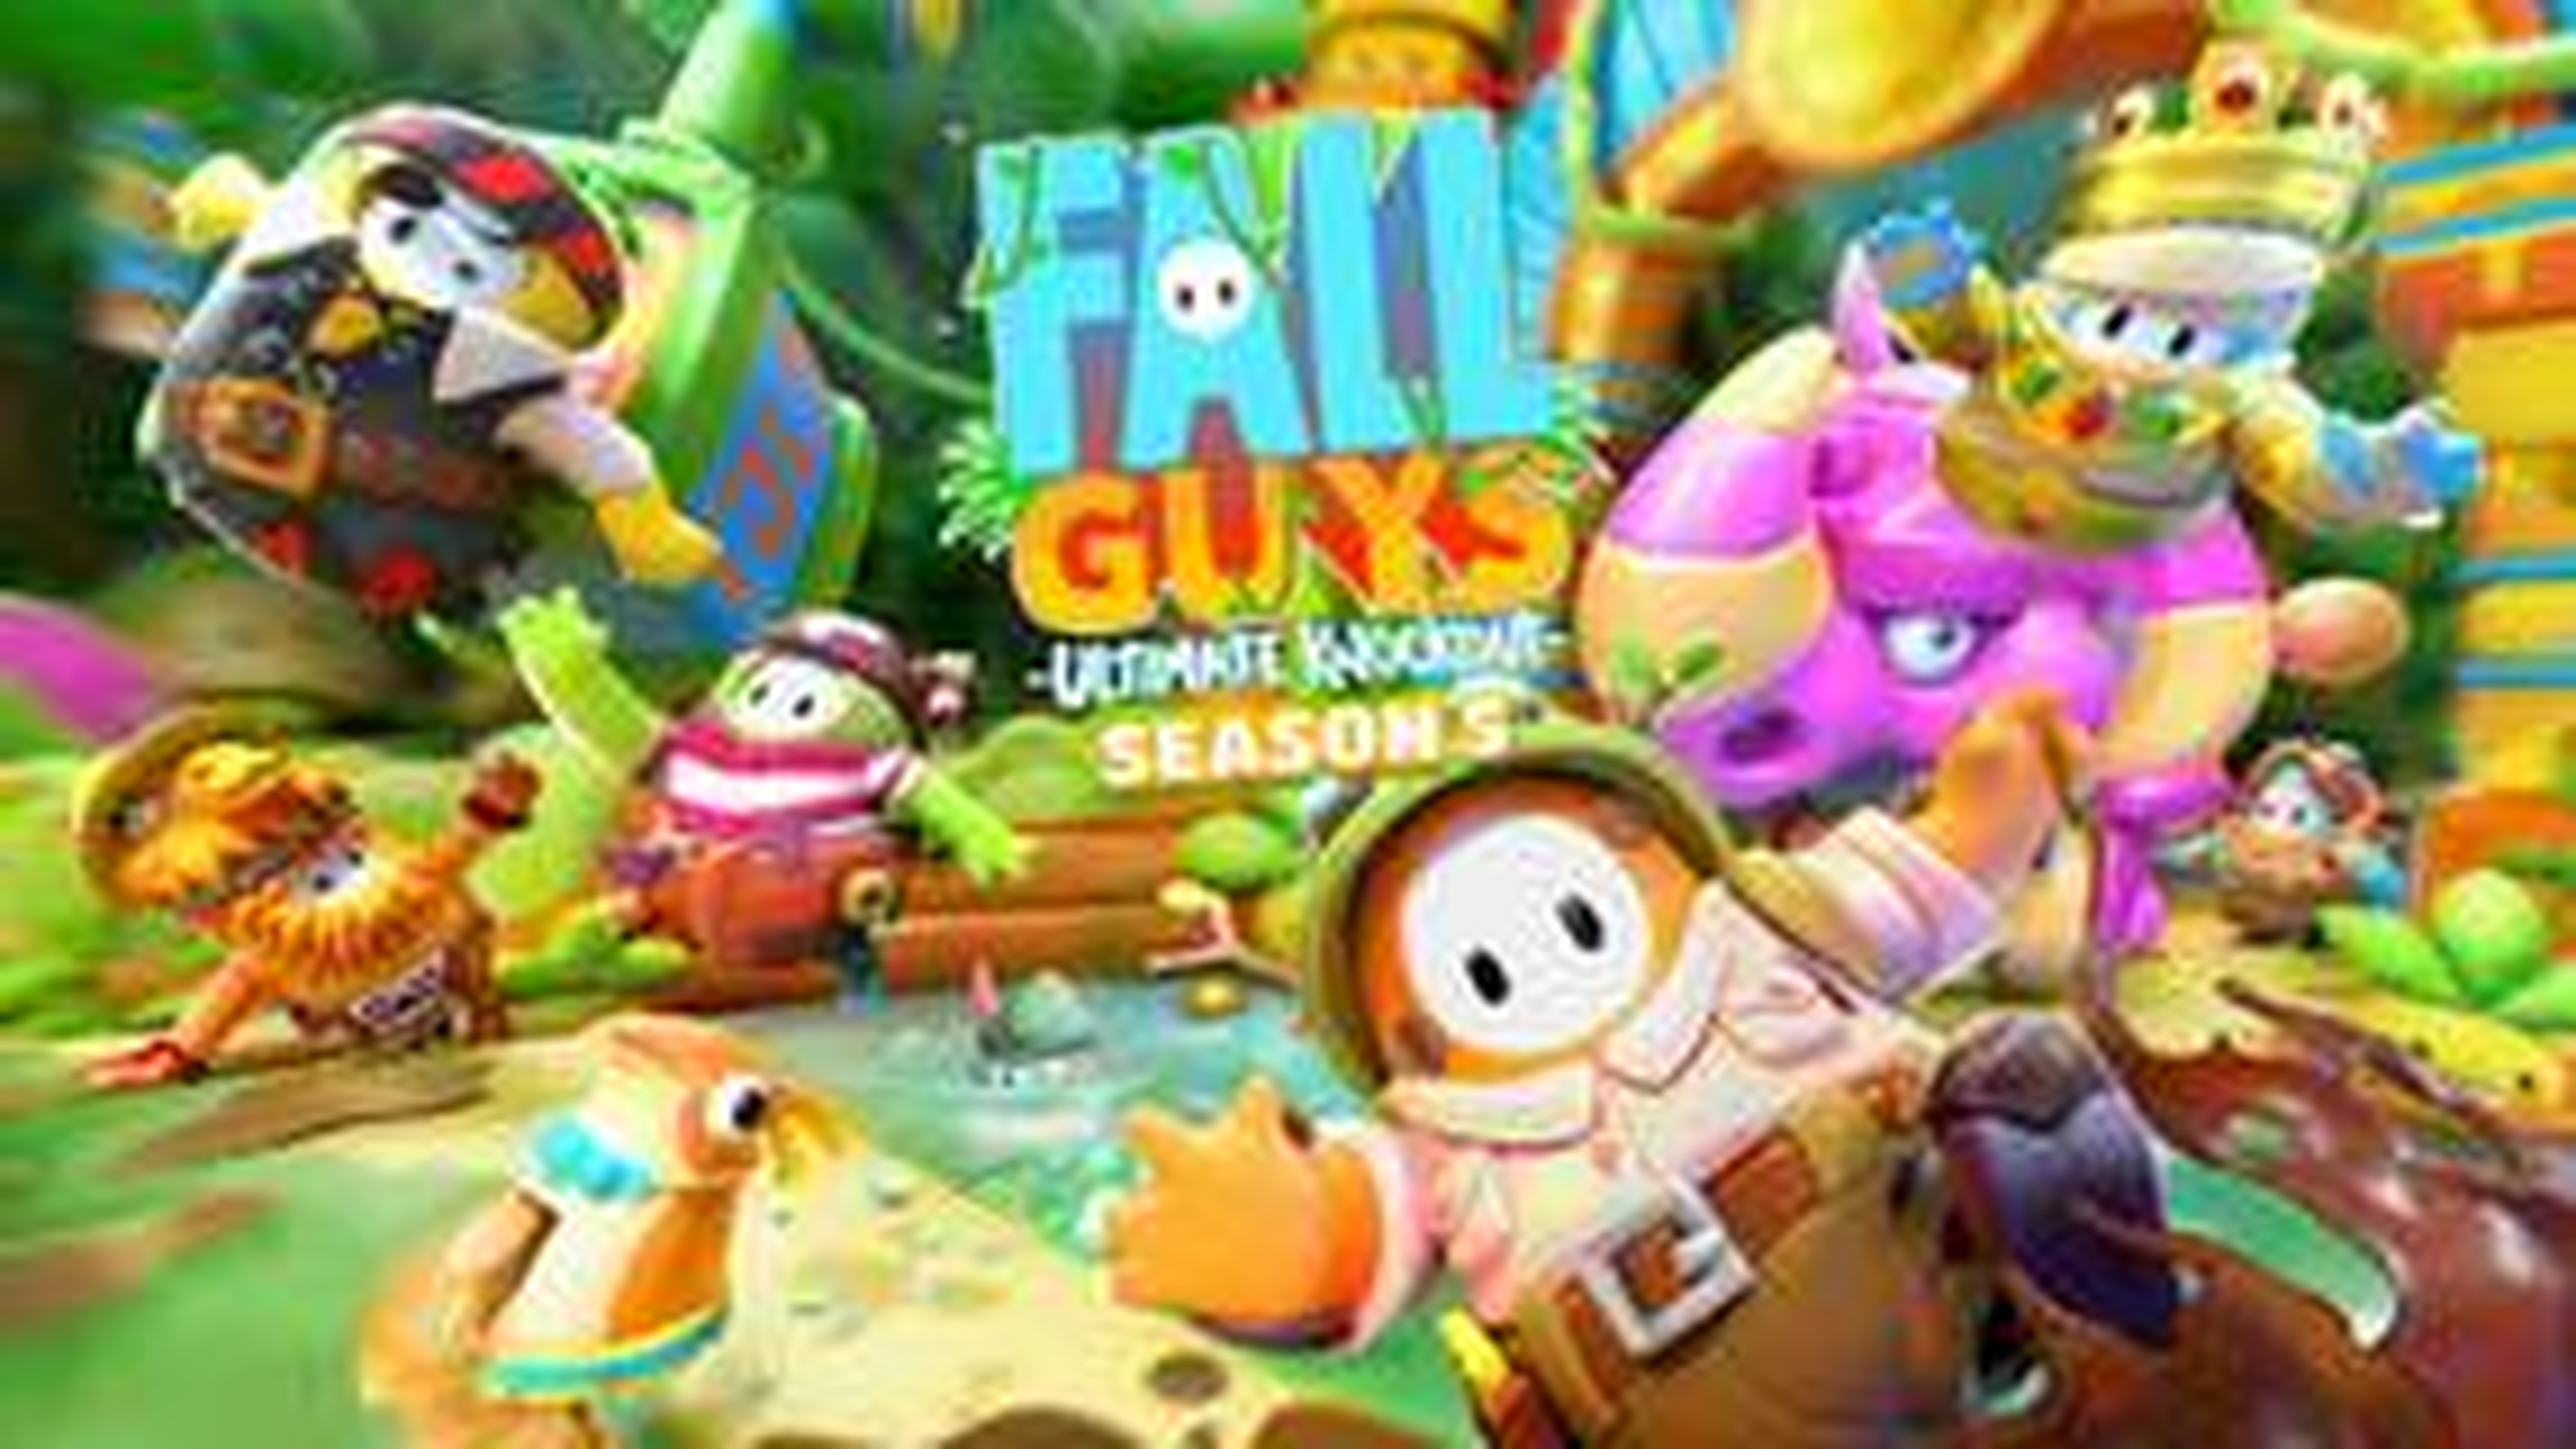 Image for Fall Guys Season 5 kicks off a Jungle Adventure on July 20 [Update]